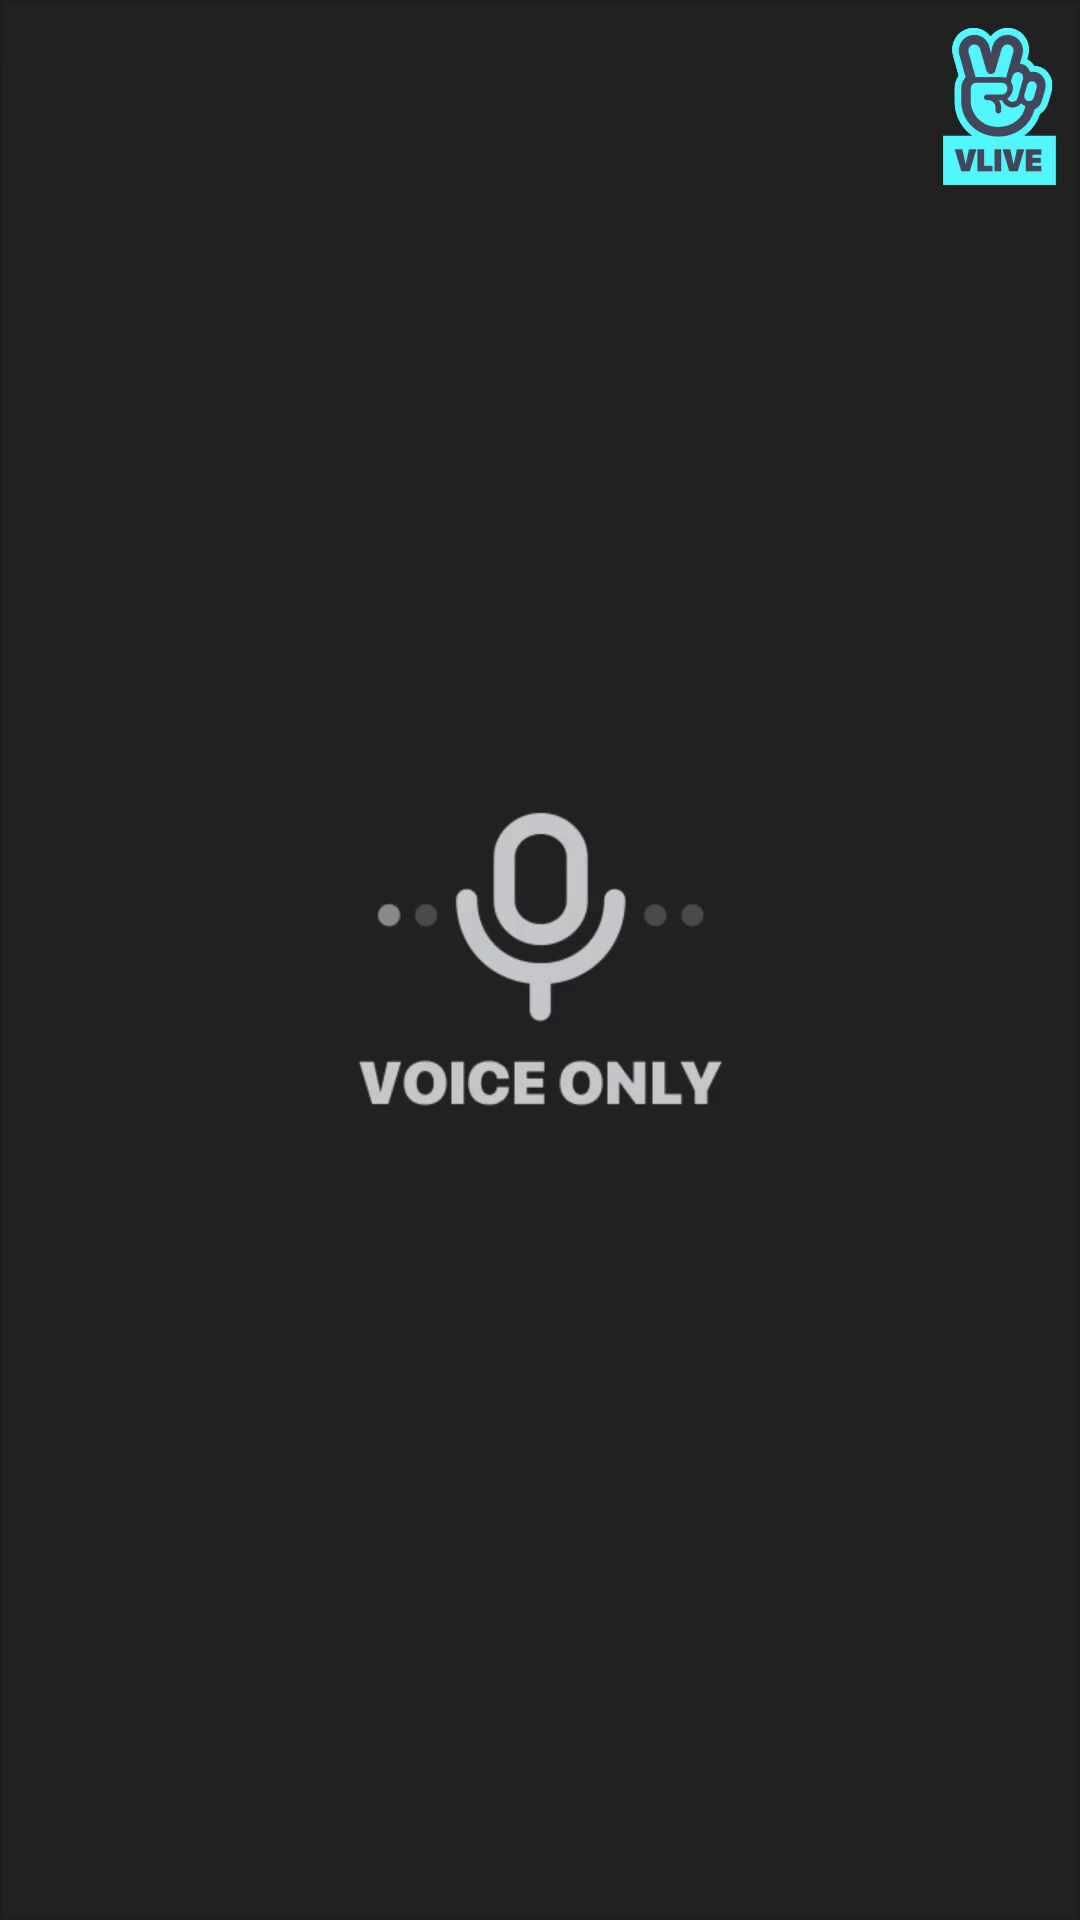 [RADIO] 캐럿들 귀대귀대 #90 뿌